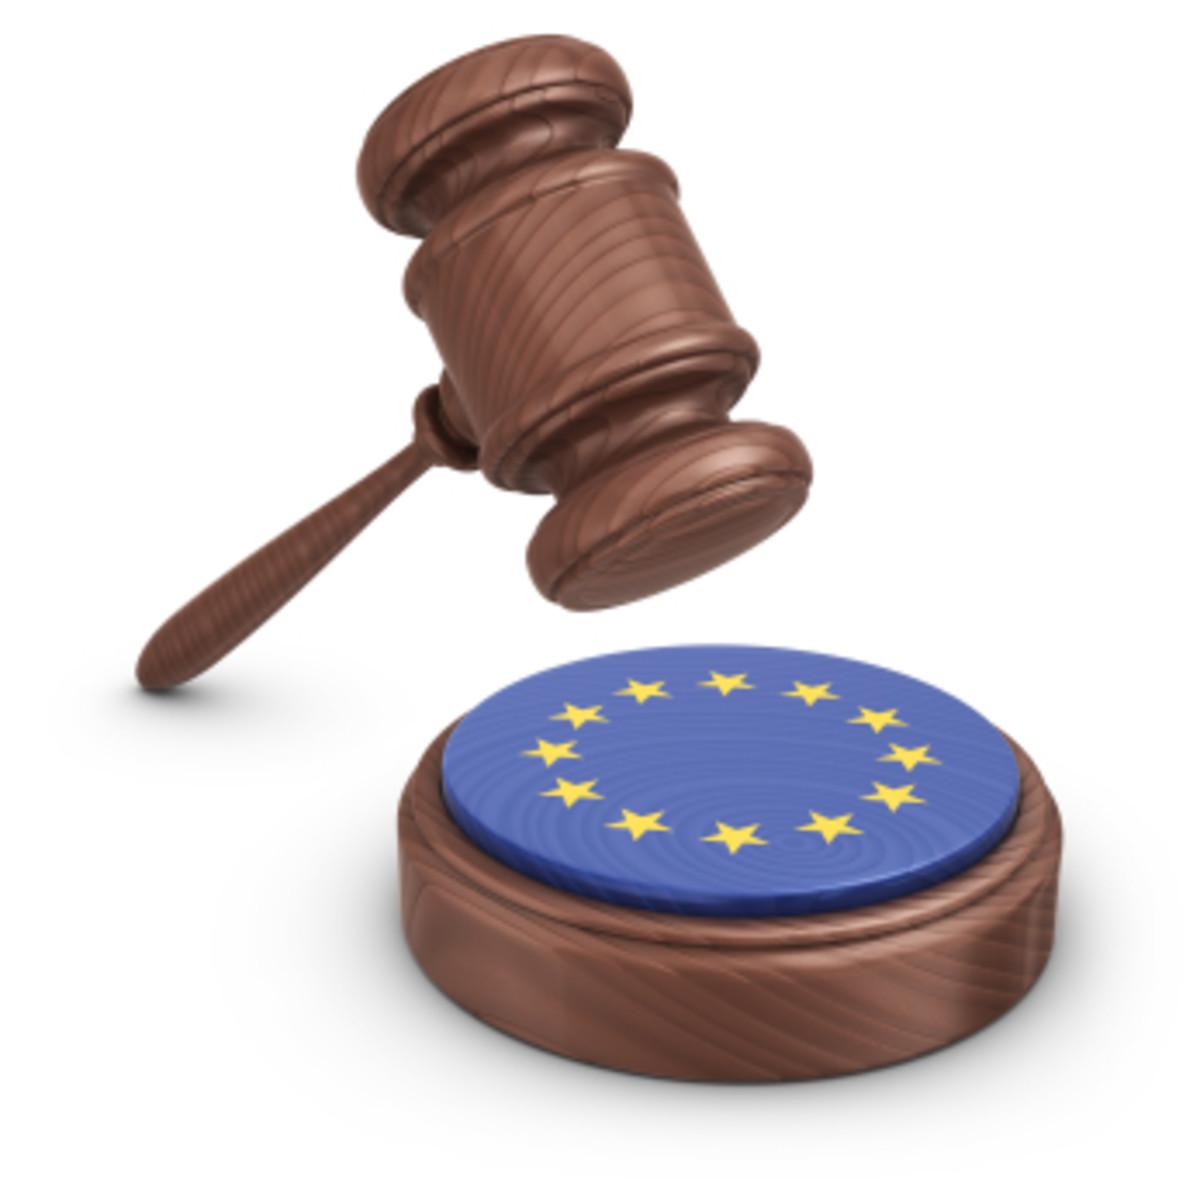 Direct Effect - EU Law